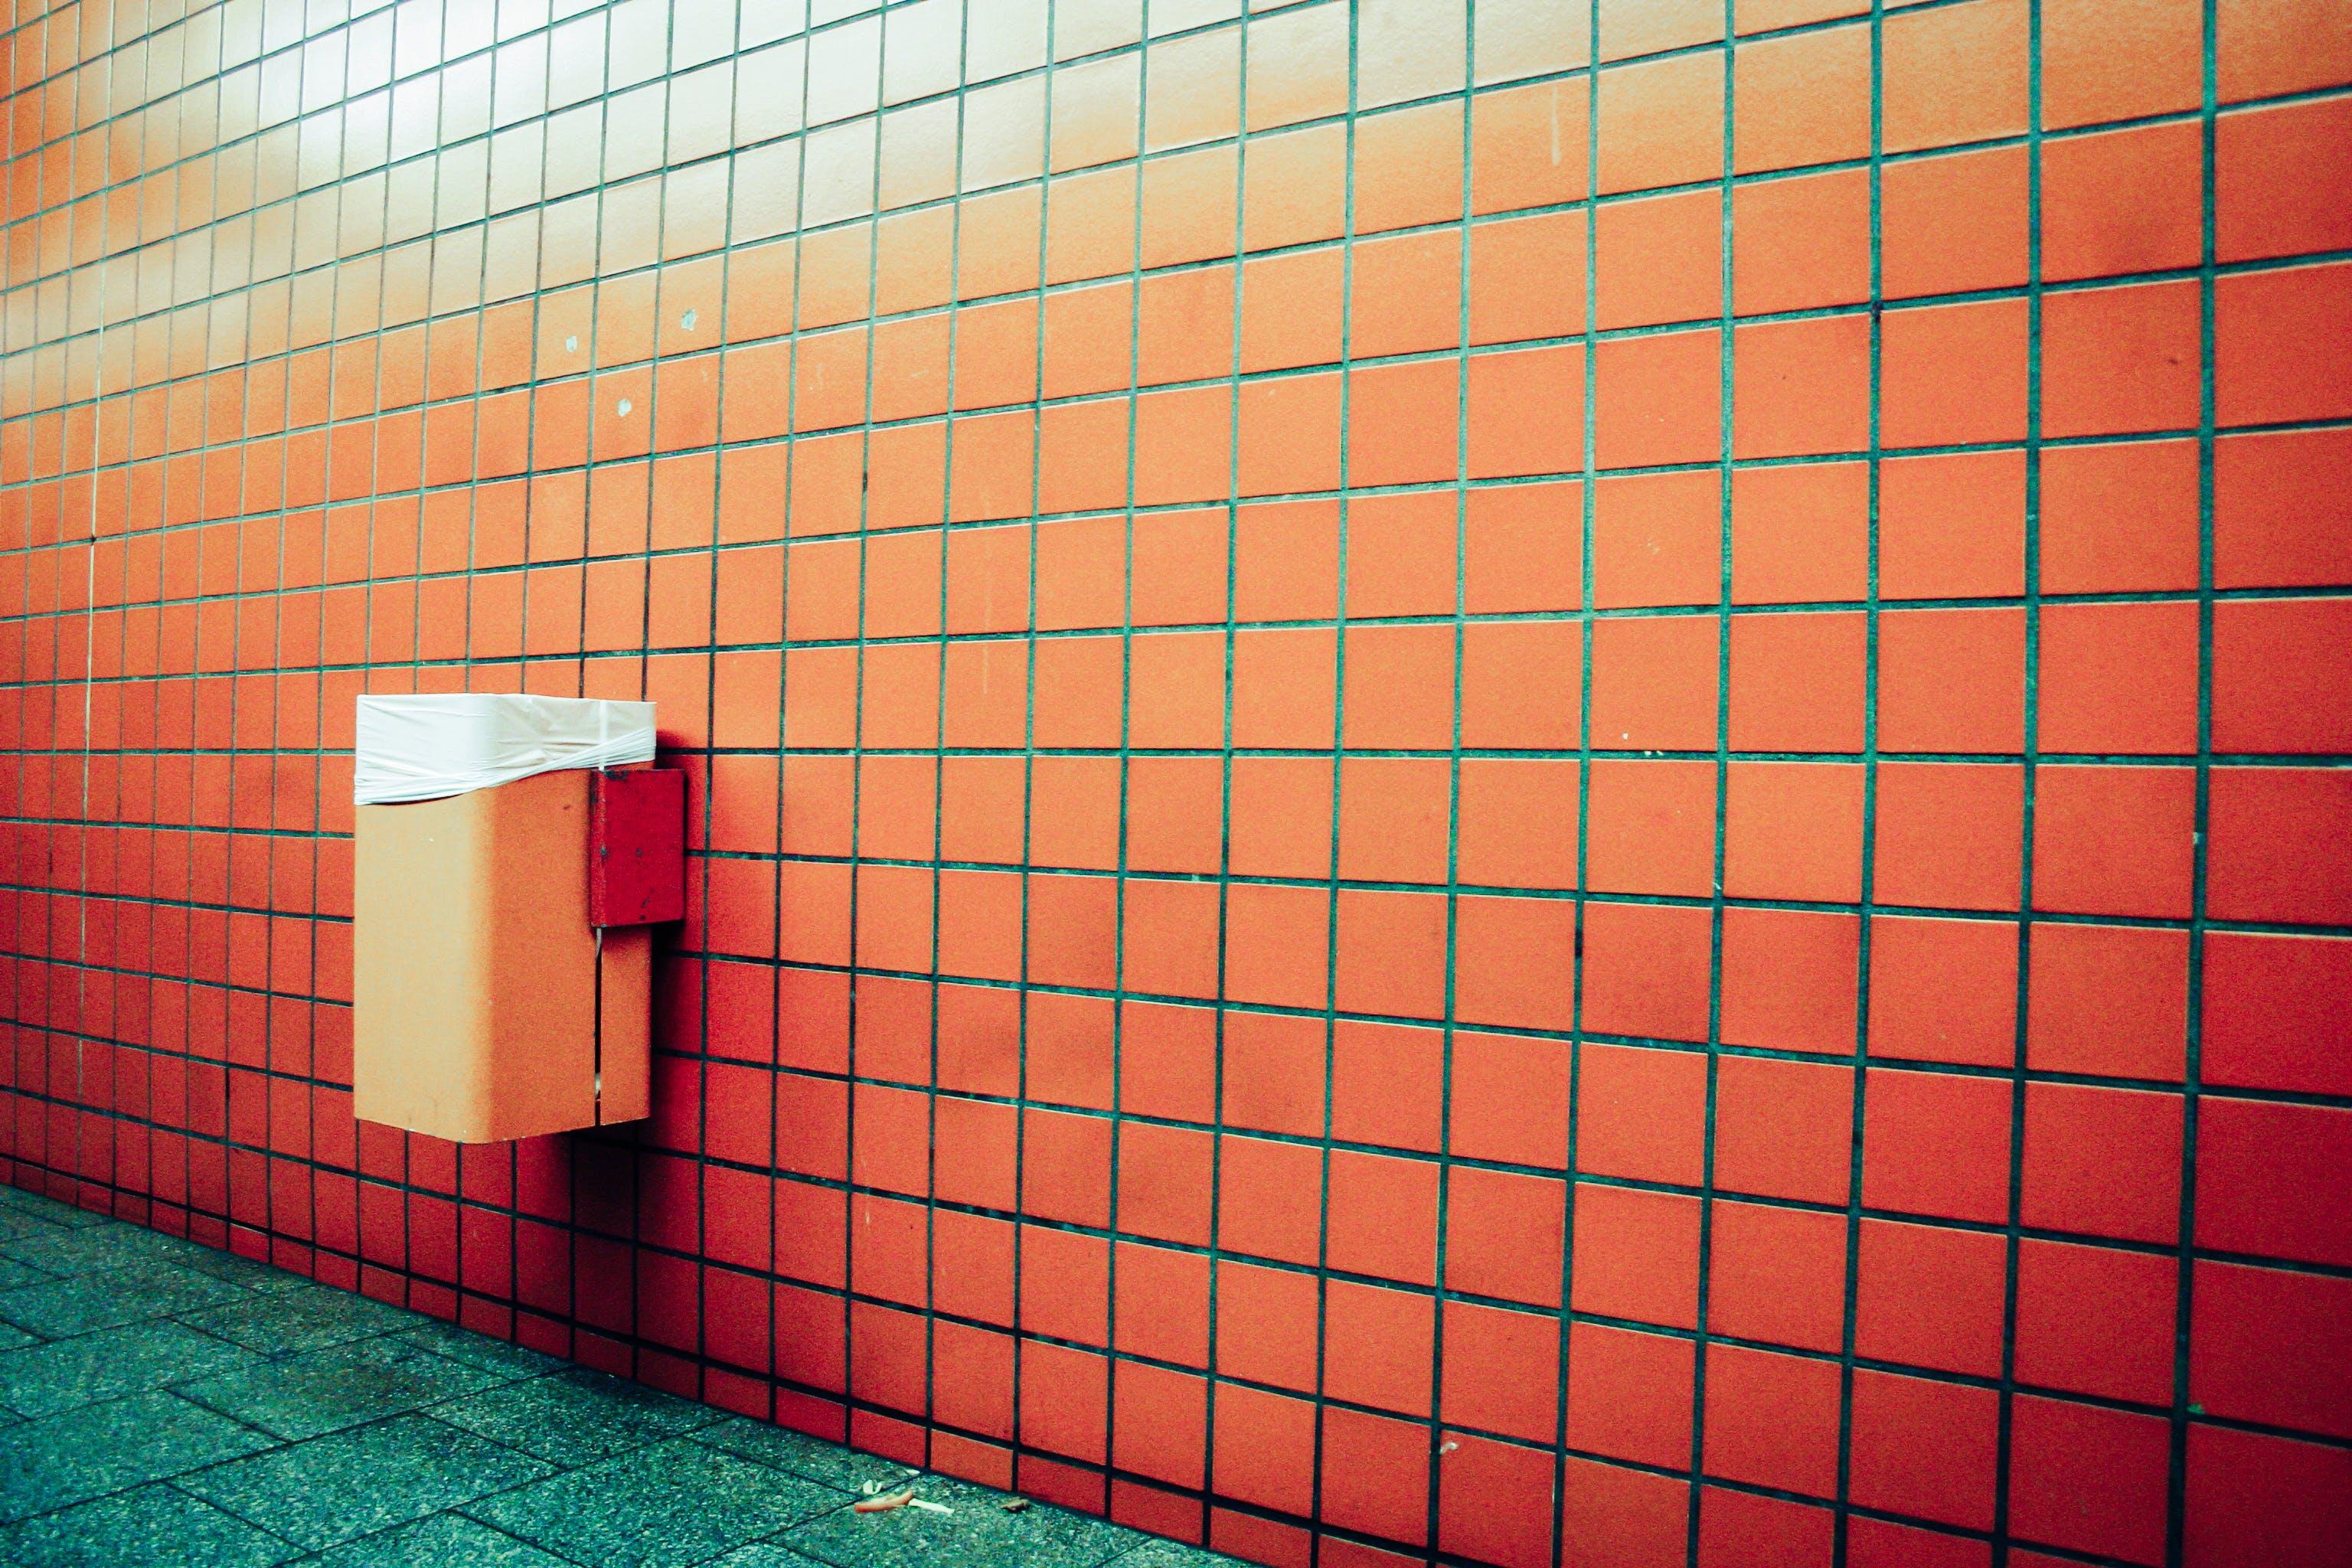 Free stock photo of wall, tiles, floor, garbage